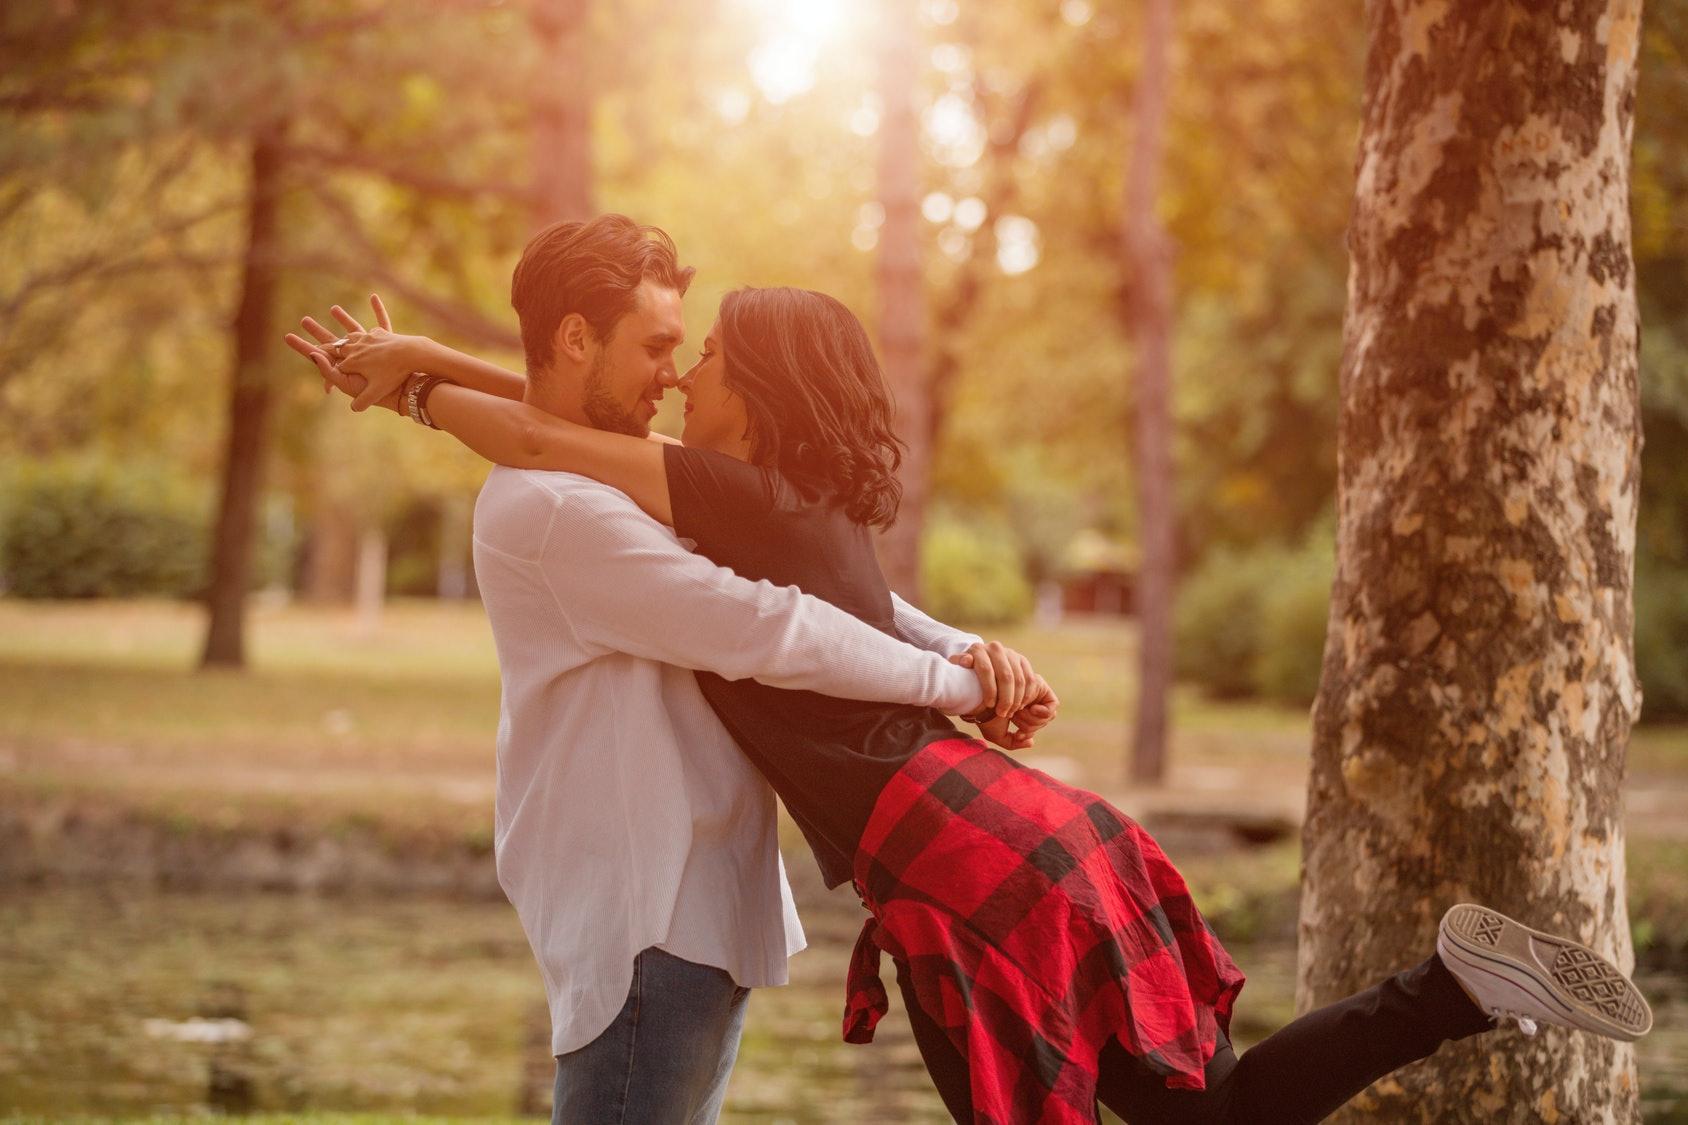 Romantic dating ideas couples on halloween night